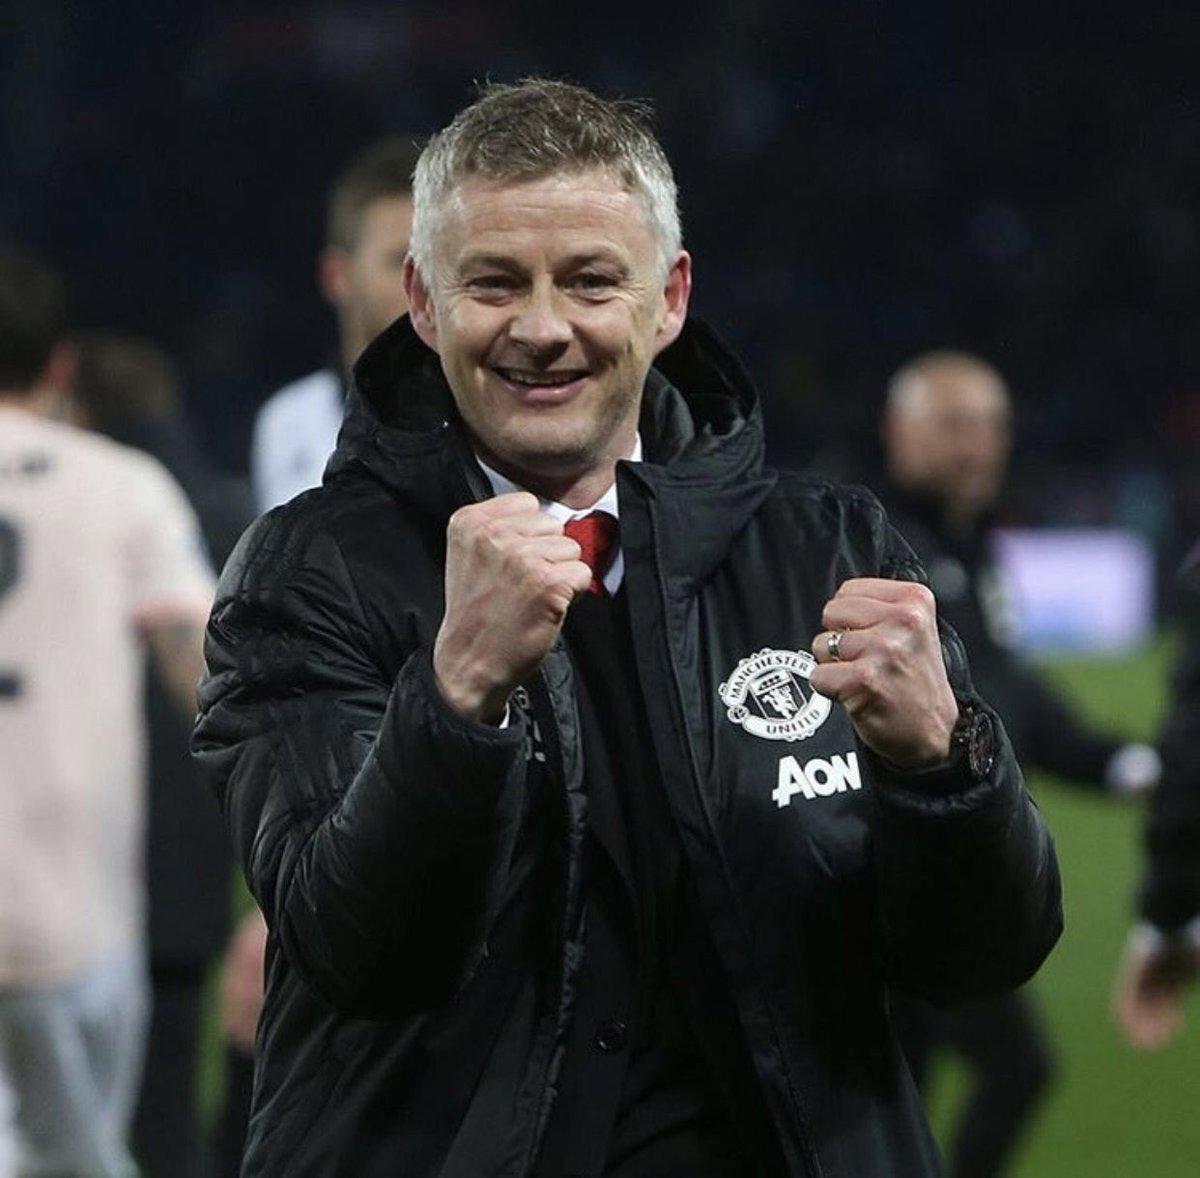 Breaking: Manchester United Appoint Solskjaer As Full-Time Manager